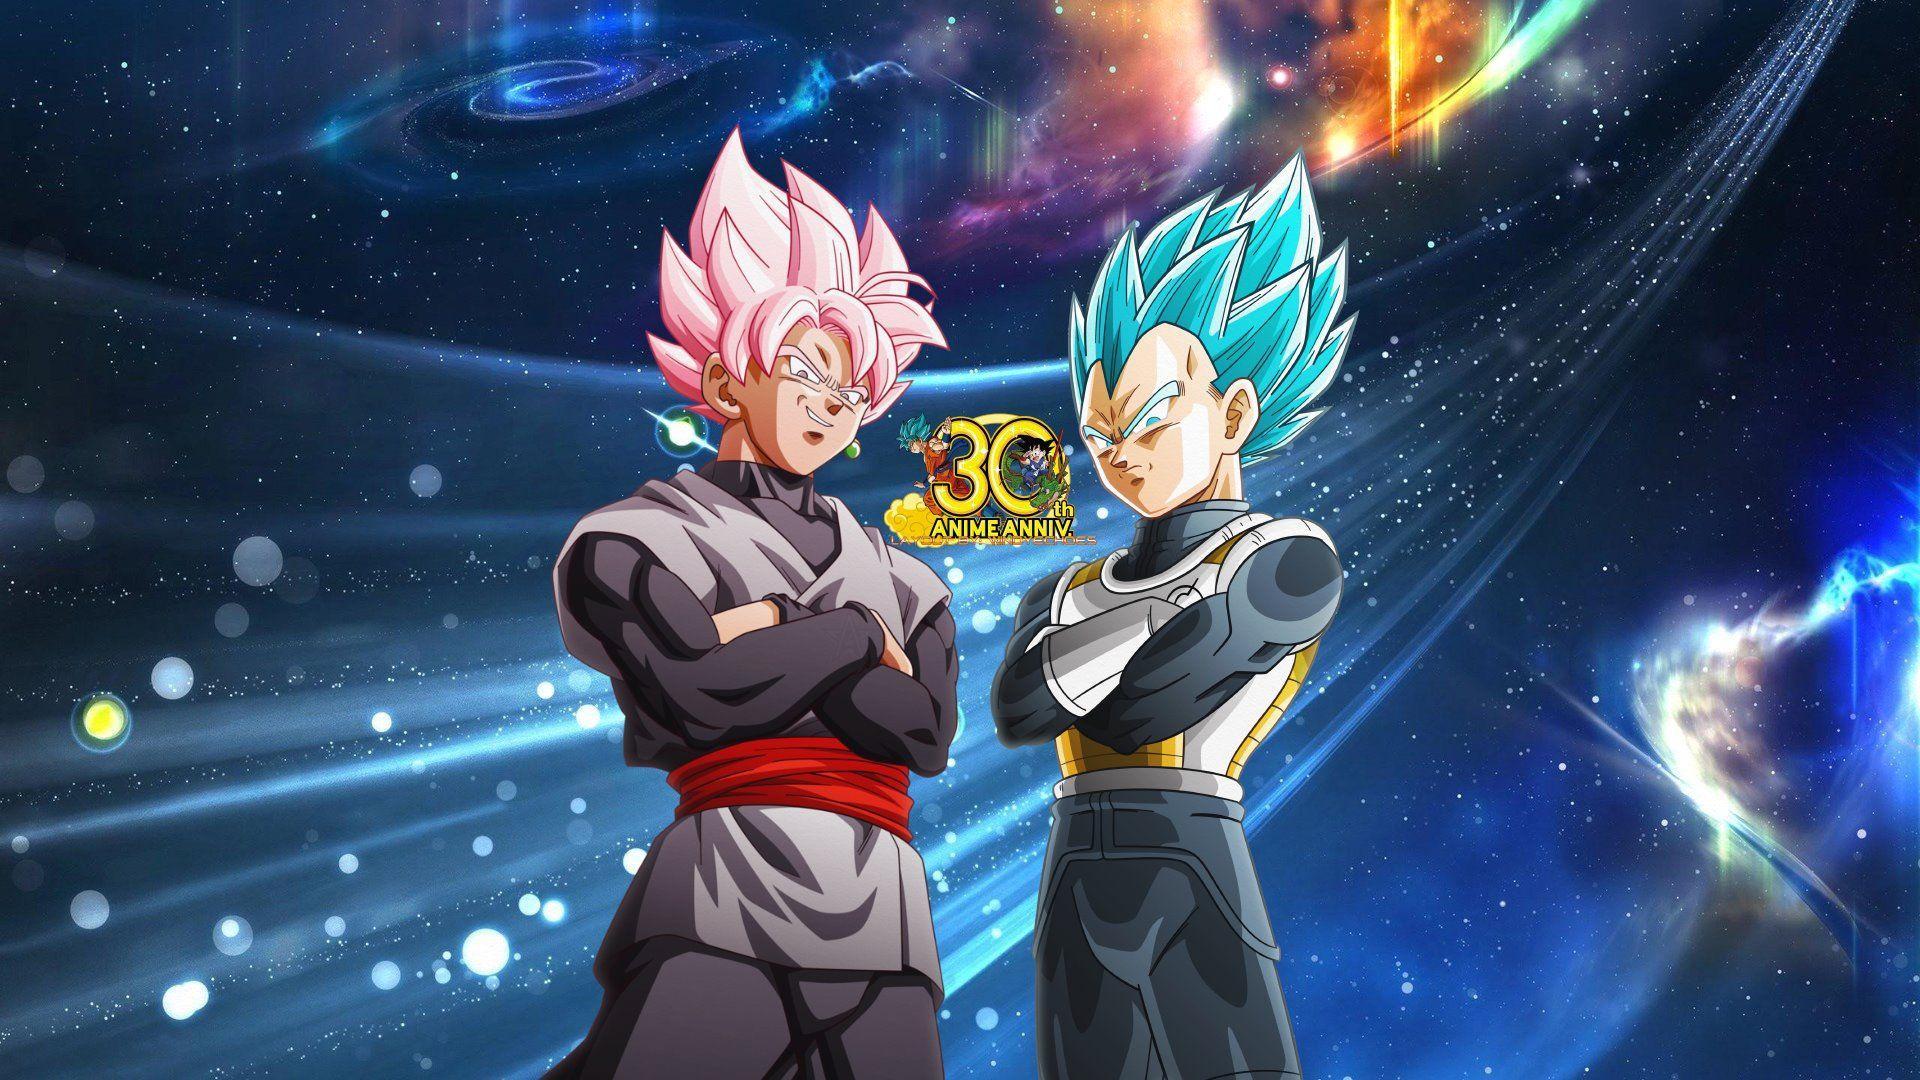 Goku Black Vs Vegeta Wallpaper Hd